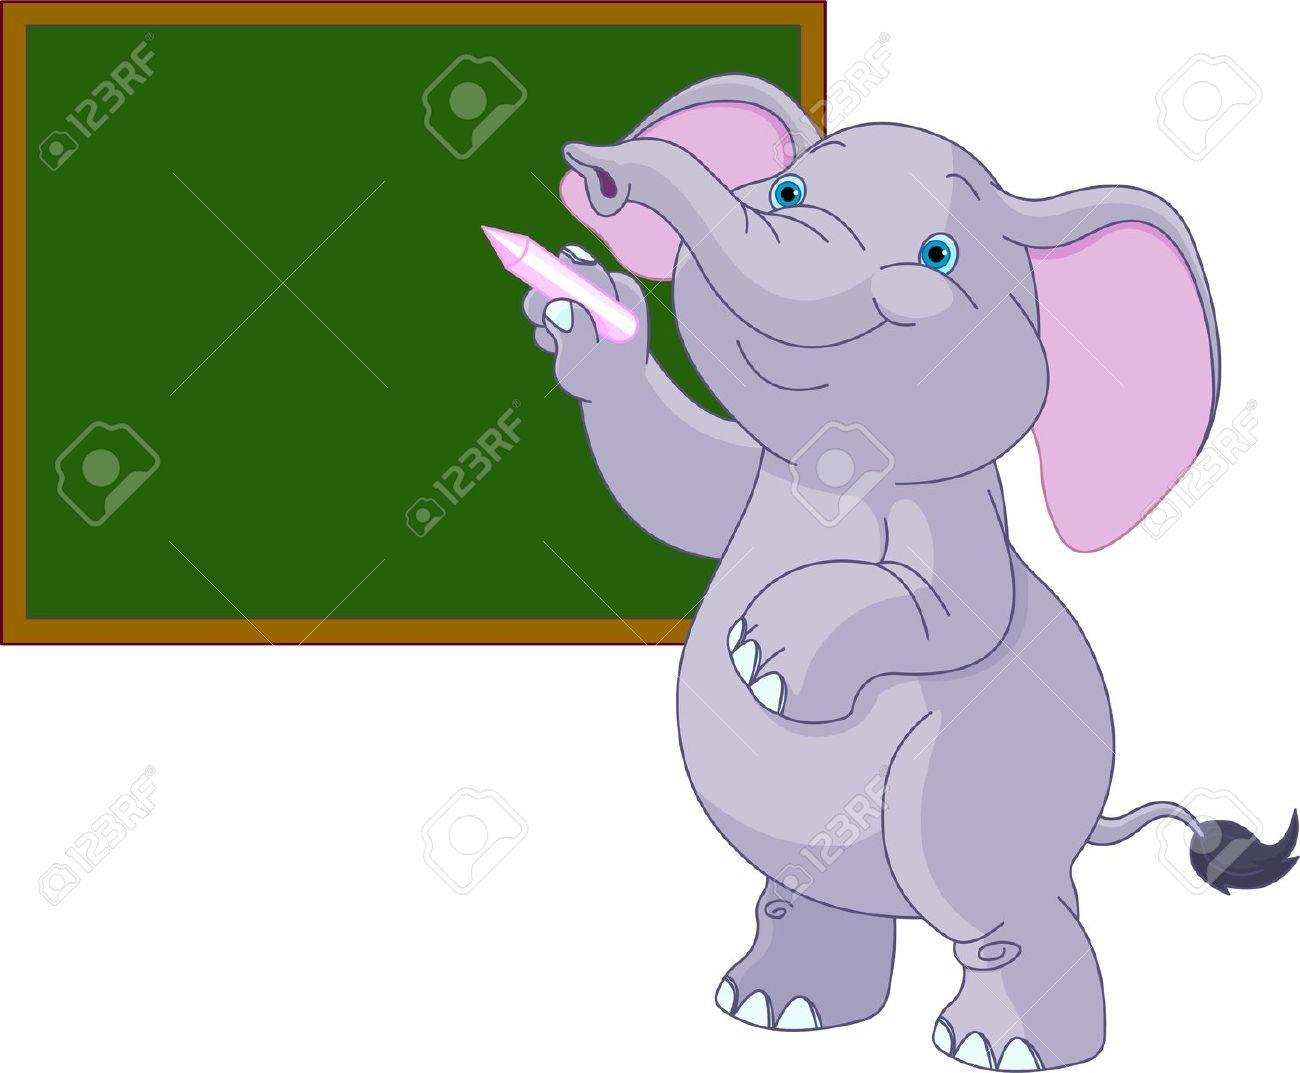 Cute Elephant Writing On Blackboard Royalty Free Cliparts, Vectors.